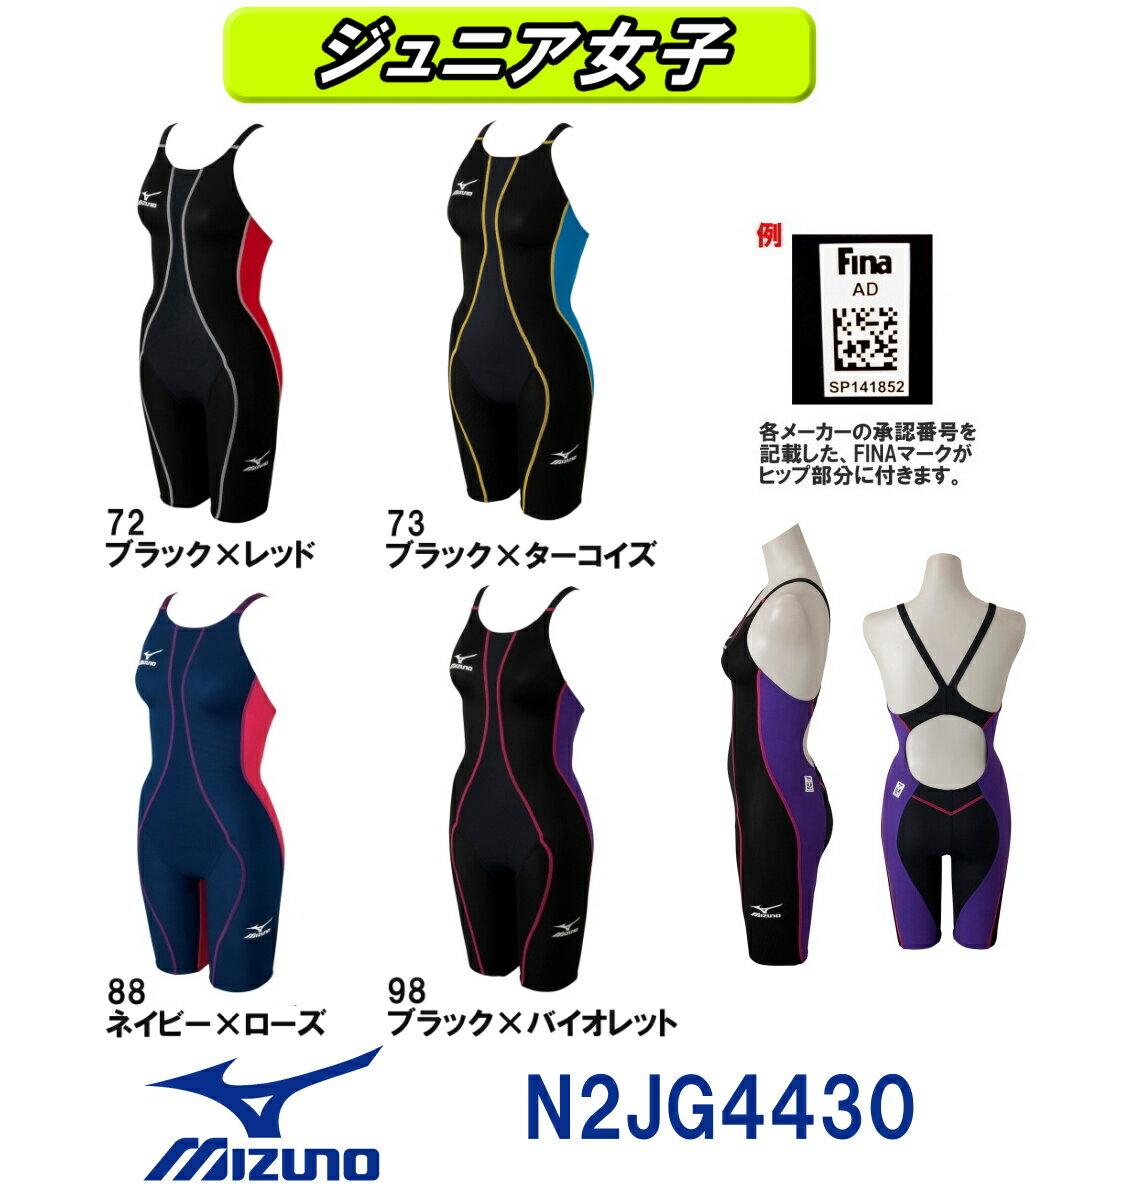 【N2JG4430】MIZUNO(ミズノ)ジュニア女子競泳用水着マイティソニックRハーフスーツ